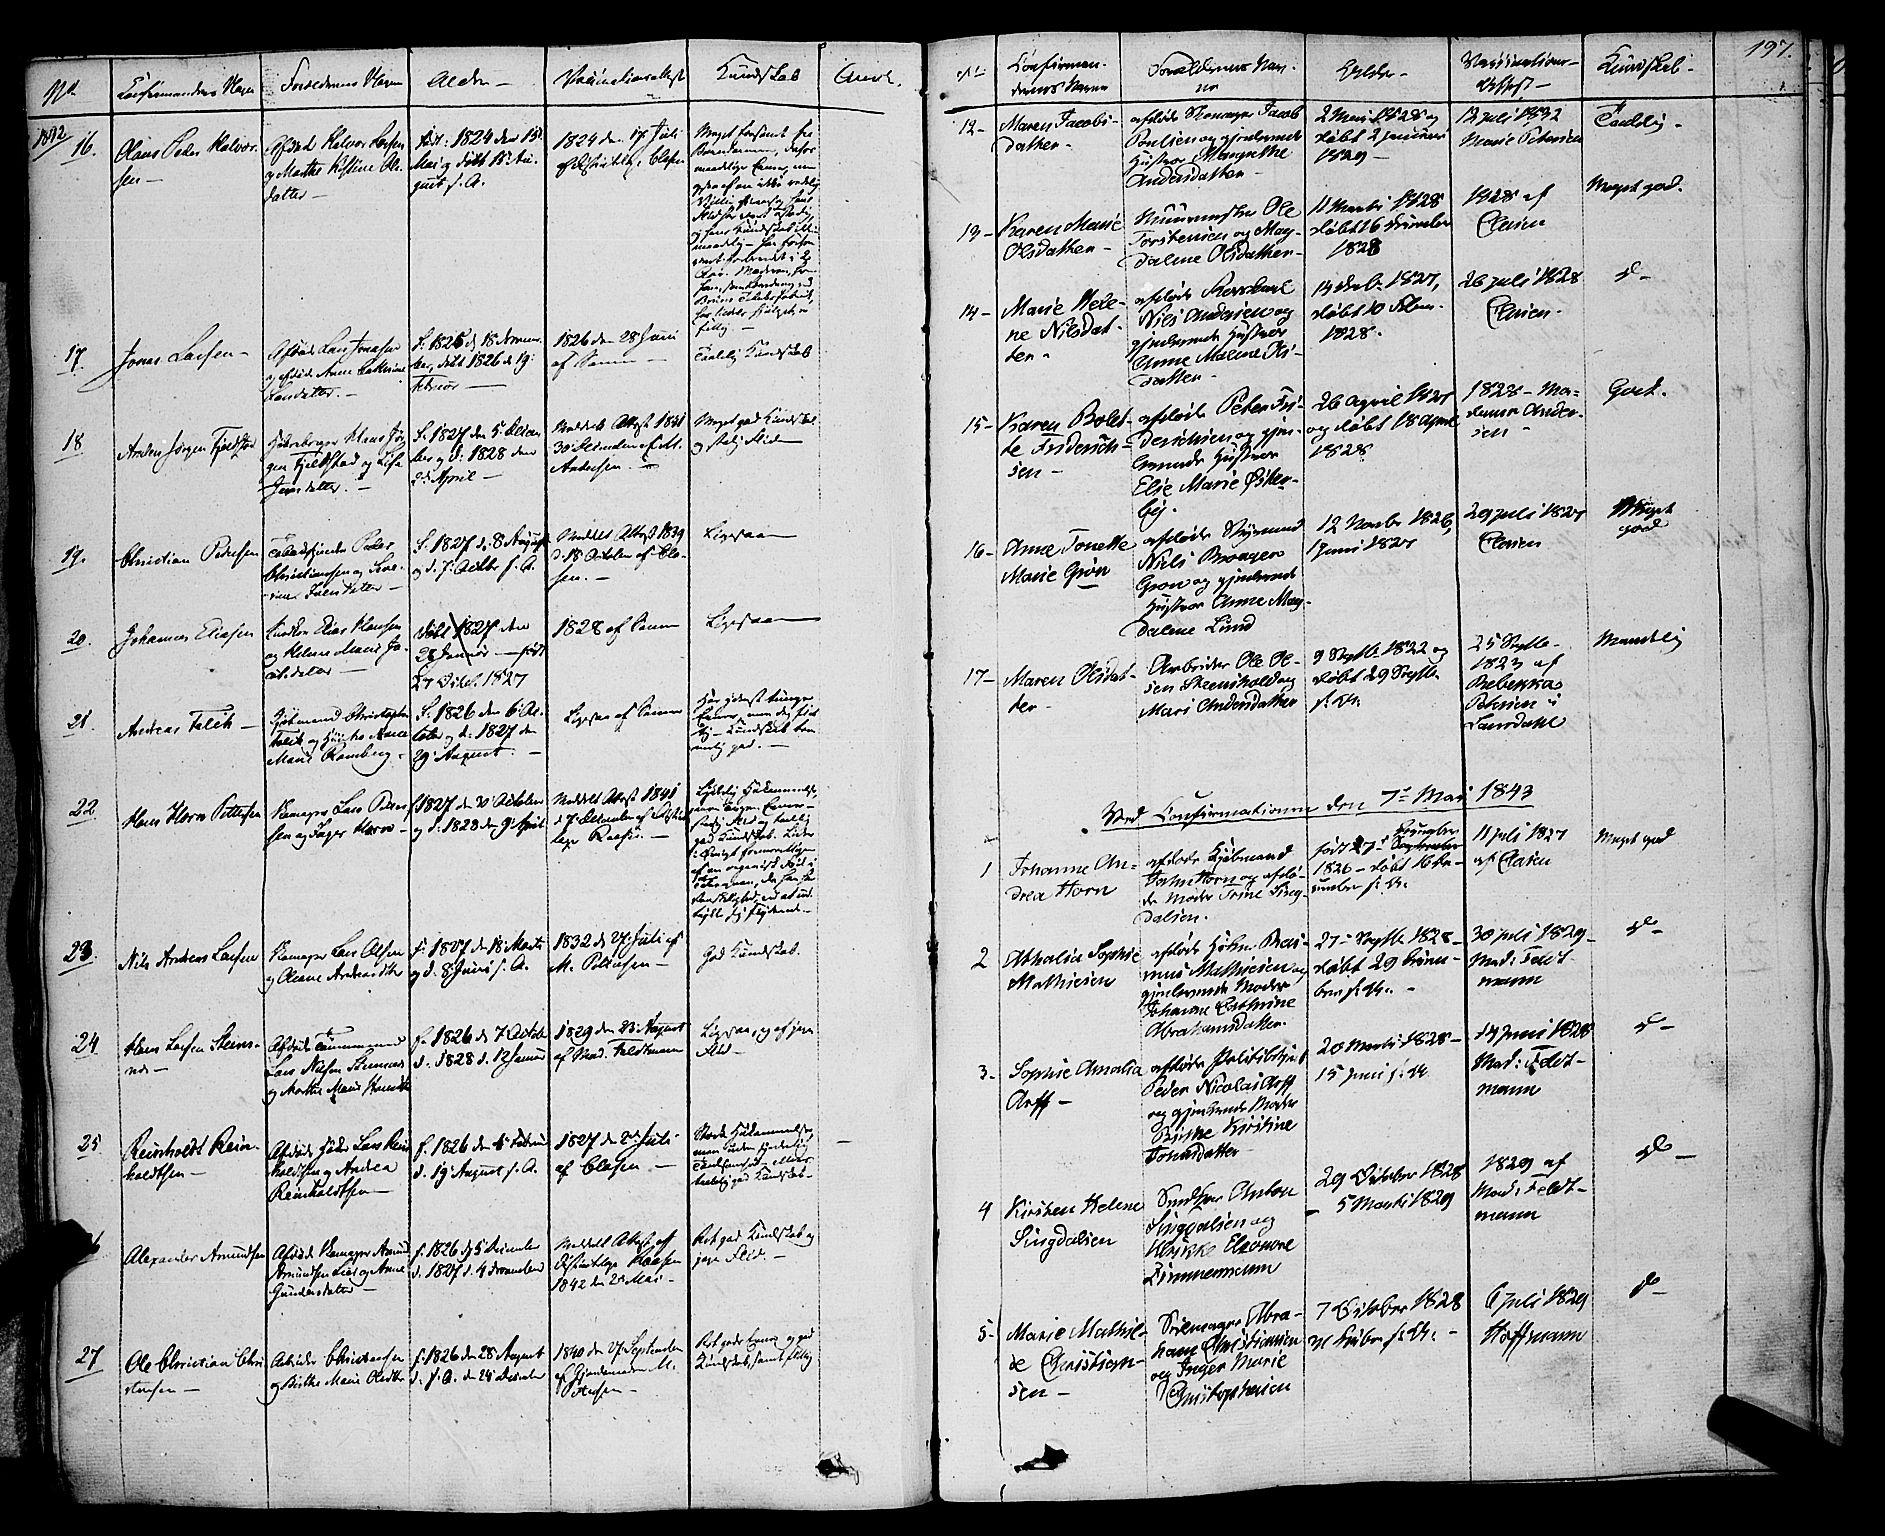 SAKO, Larvik kirkebøker, F/Fa/L0002: Ministerialbok nr. I 2, 1825-1847, s. 197